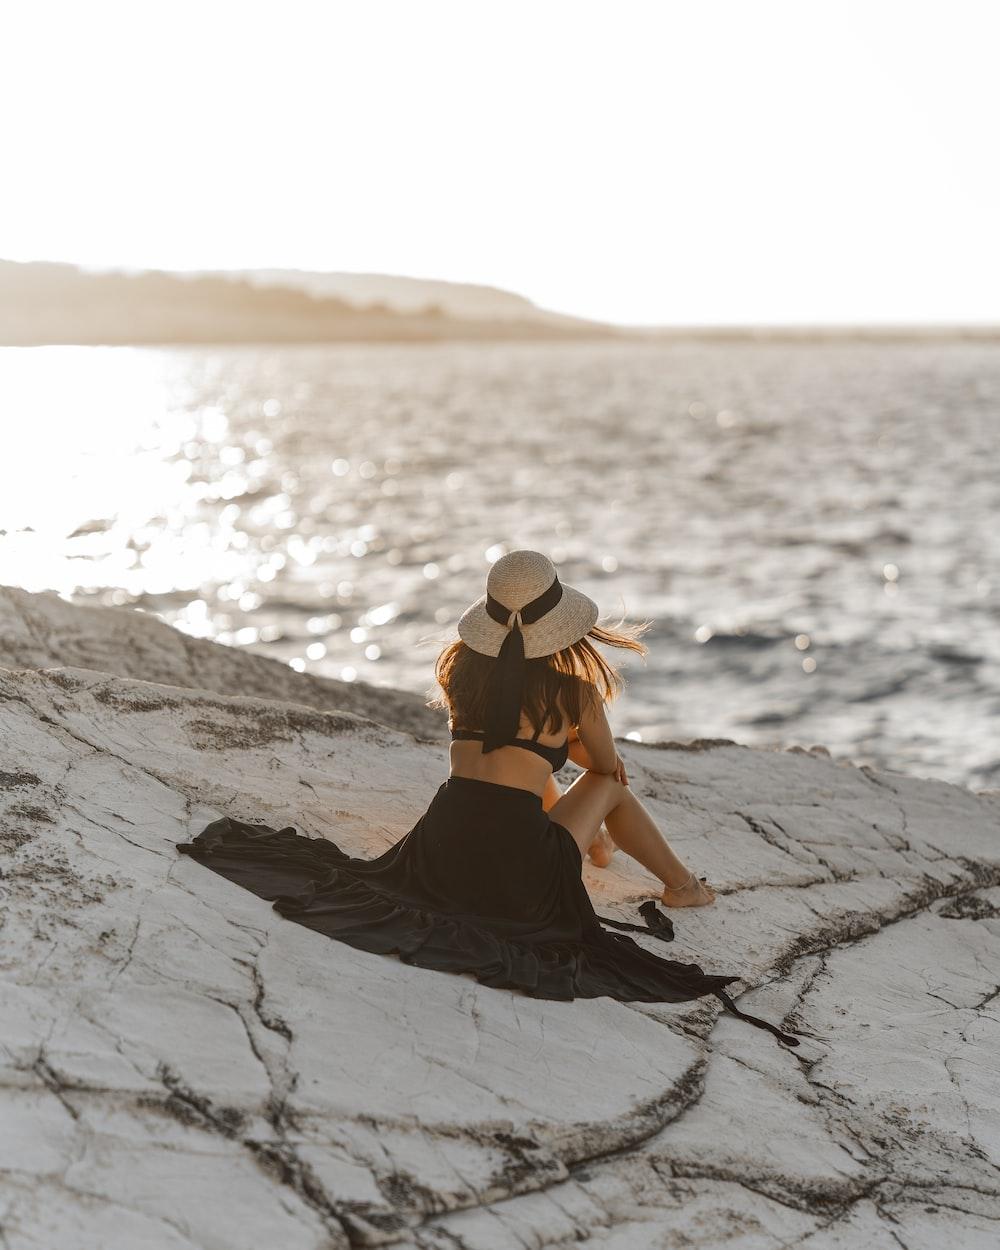 woman in black bikini sitting on rock formation during daytime